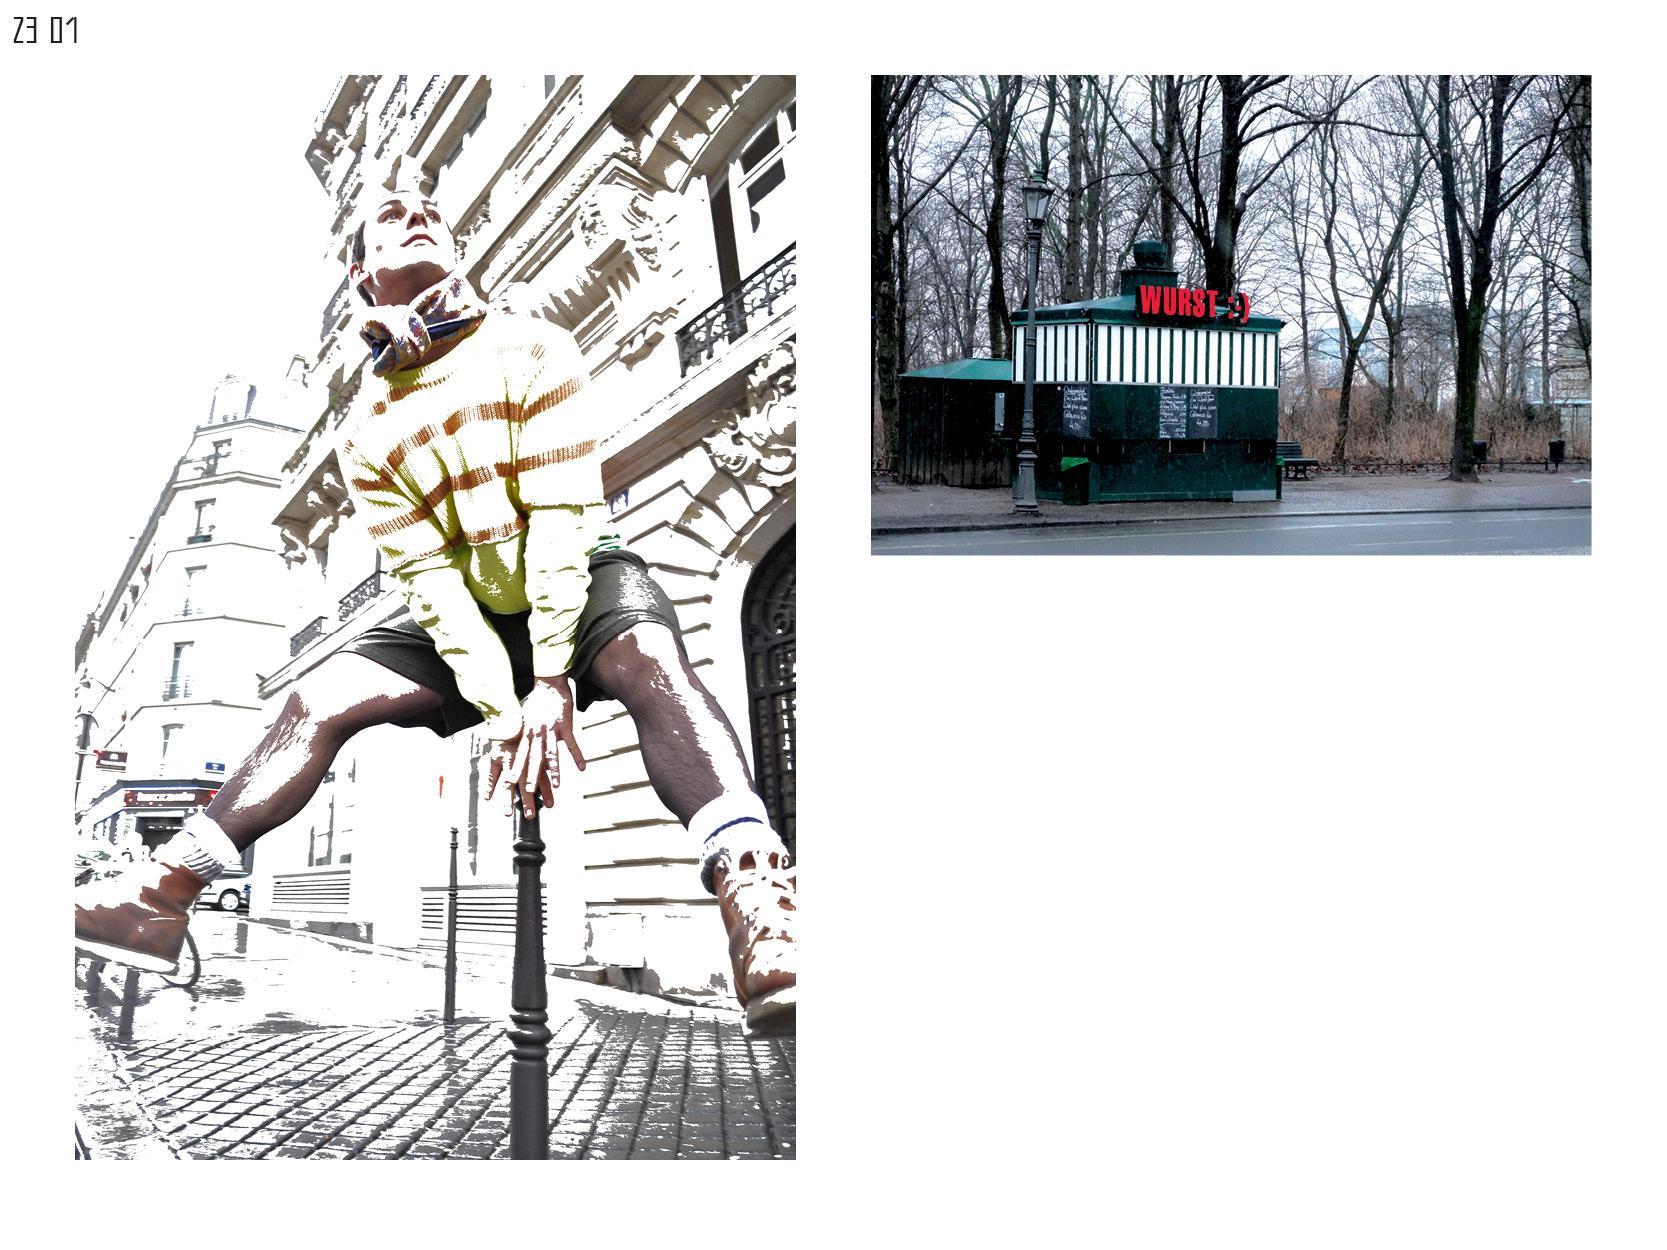 Gerrit-Schweiger-Dialog-Städte-Paris-Berlin-Jessica-Blank-Experiment-Fotoserie-Tagebuch-visuelle-Kommunikation-84